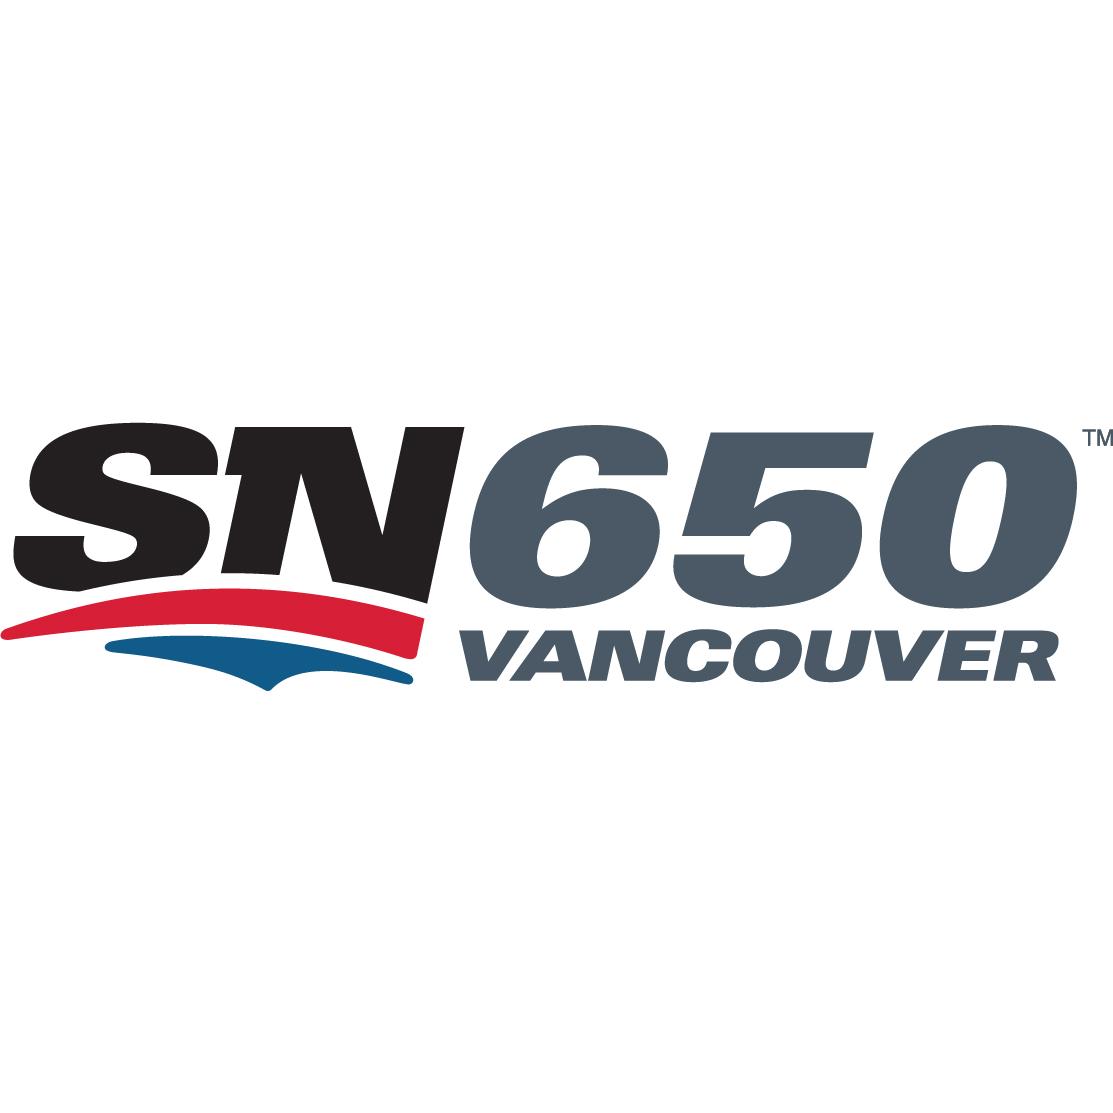 Sn 650 secondary